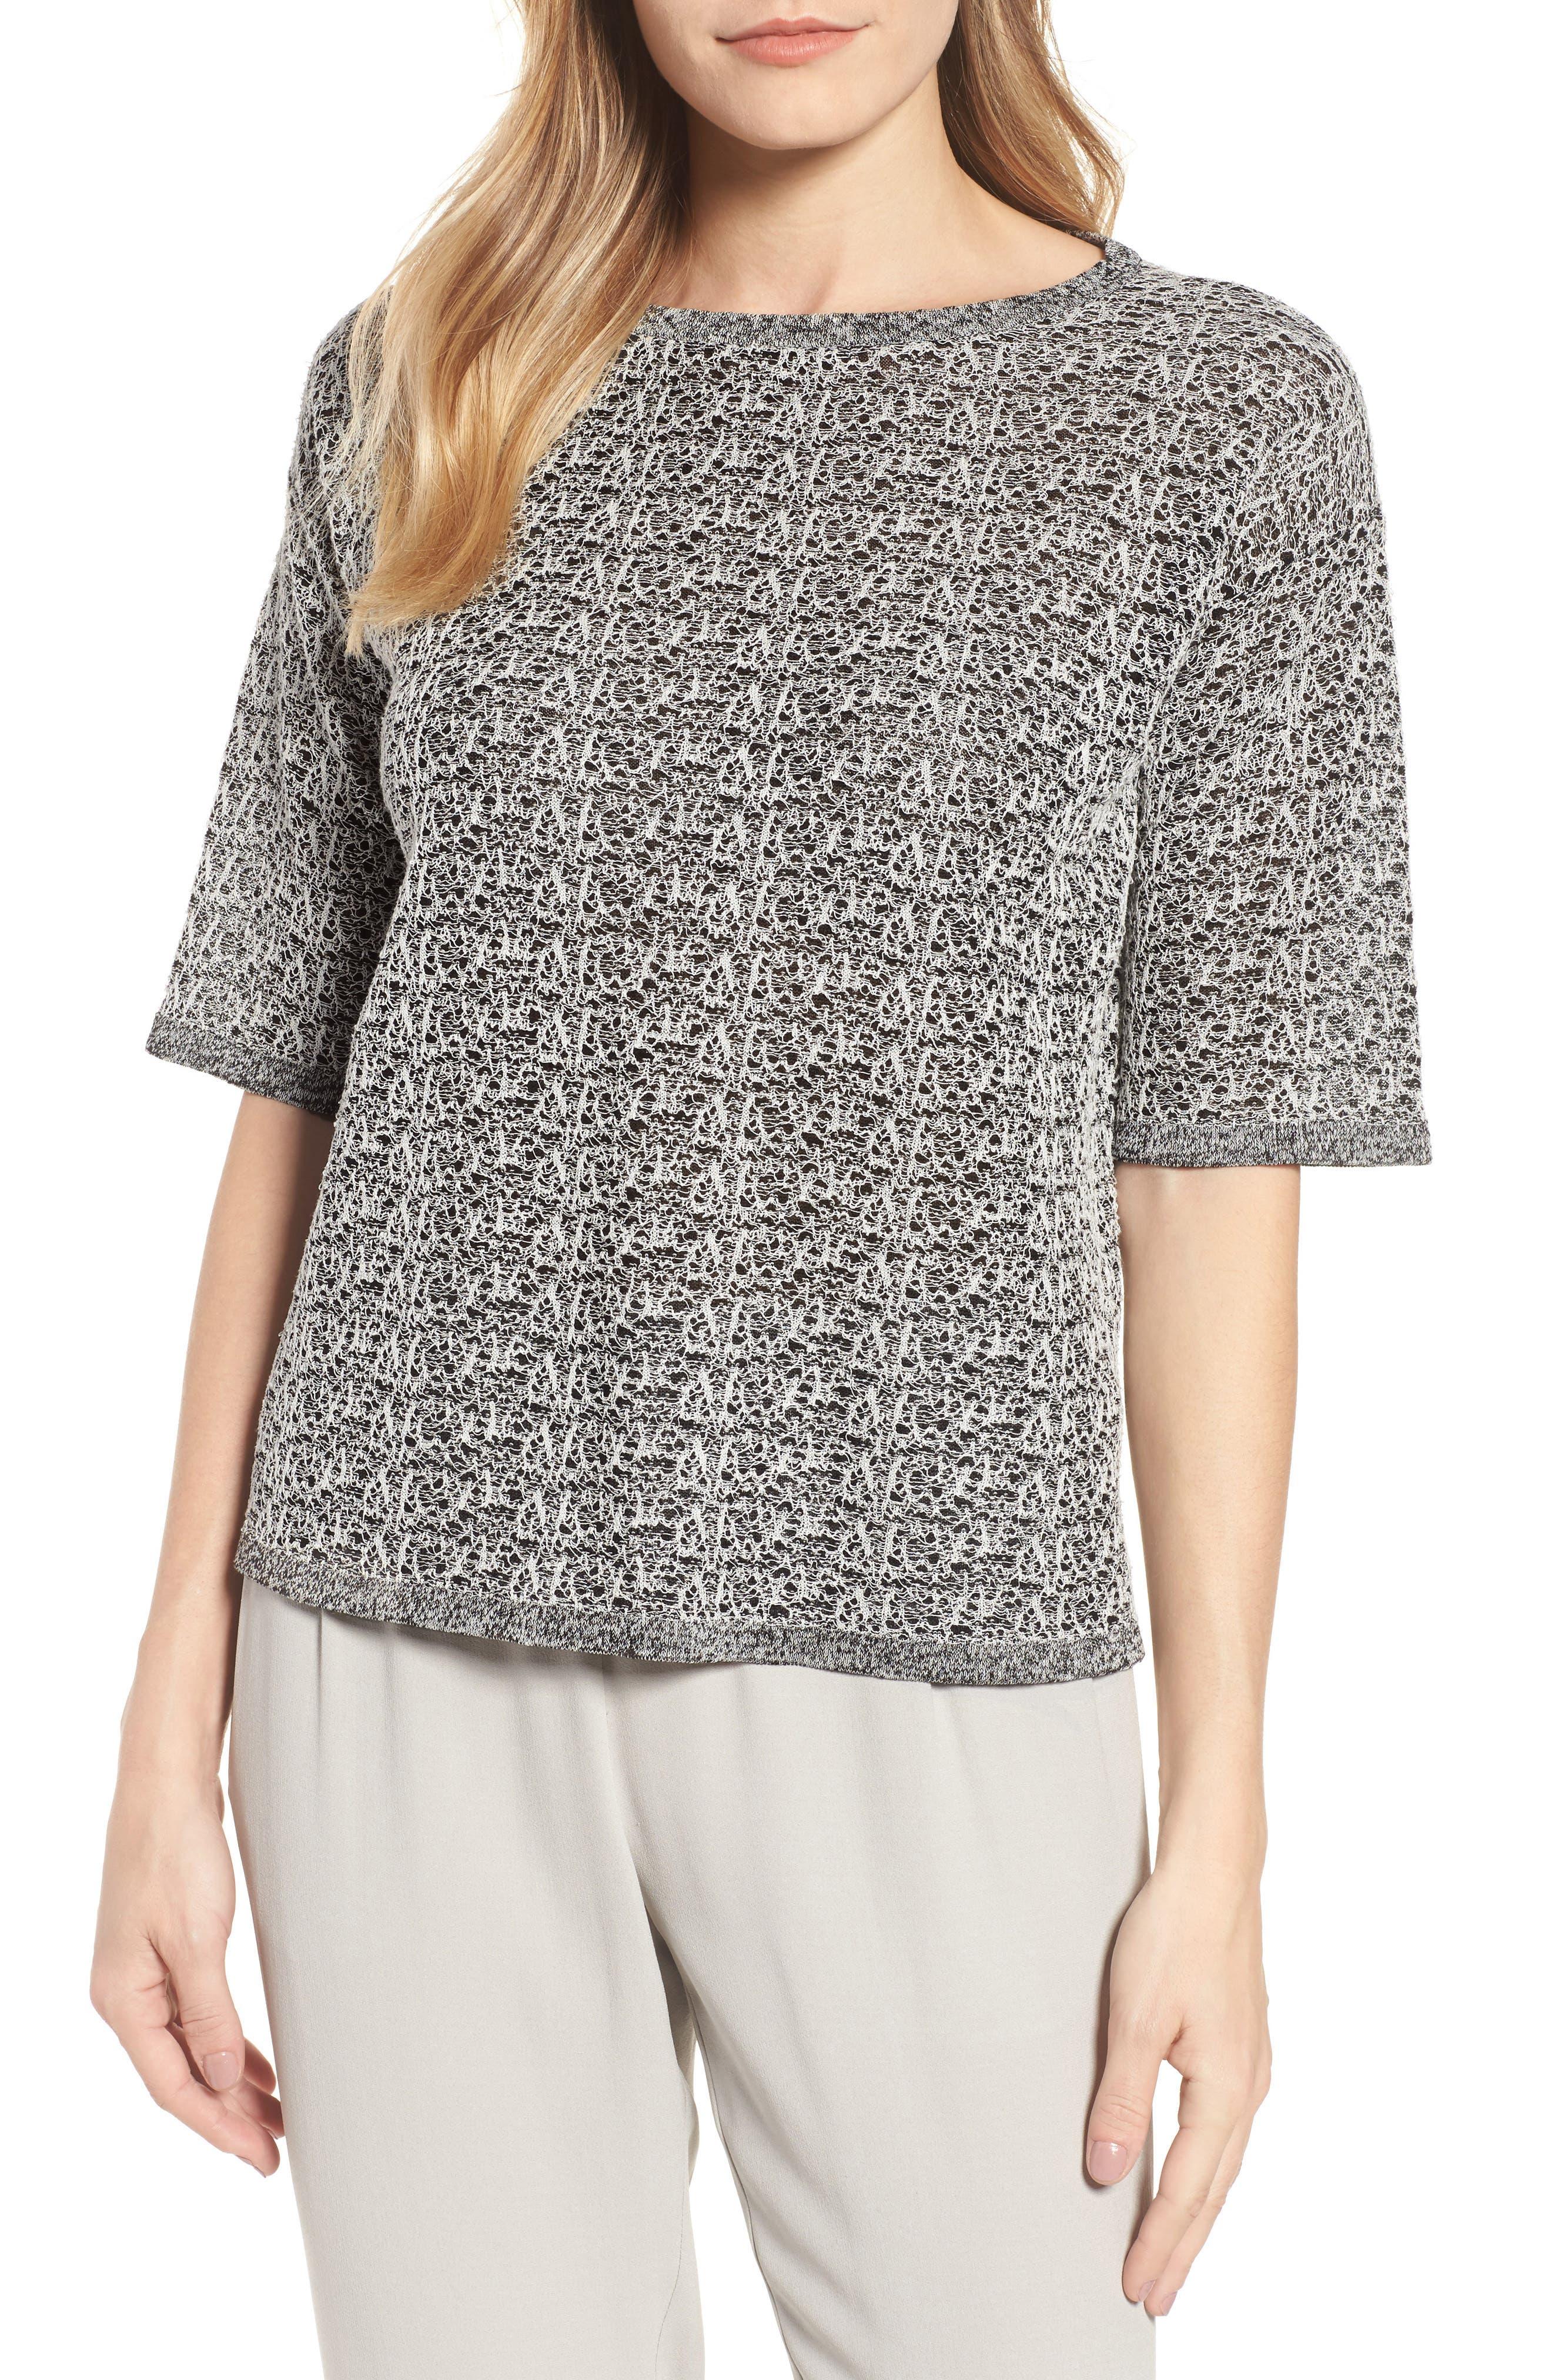 Organic Linen Blend Knit Top,                         Main,                         color,